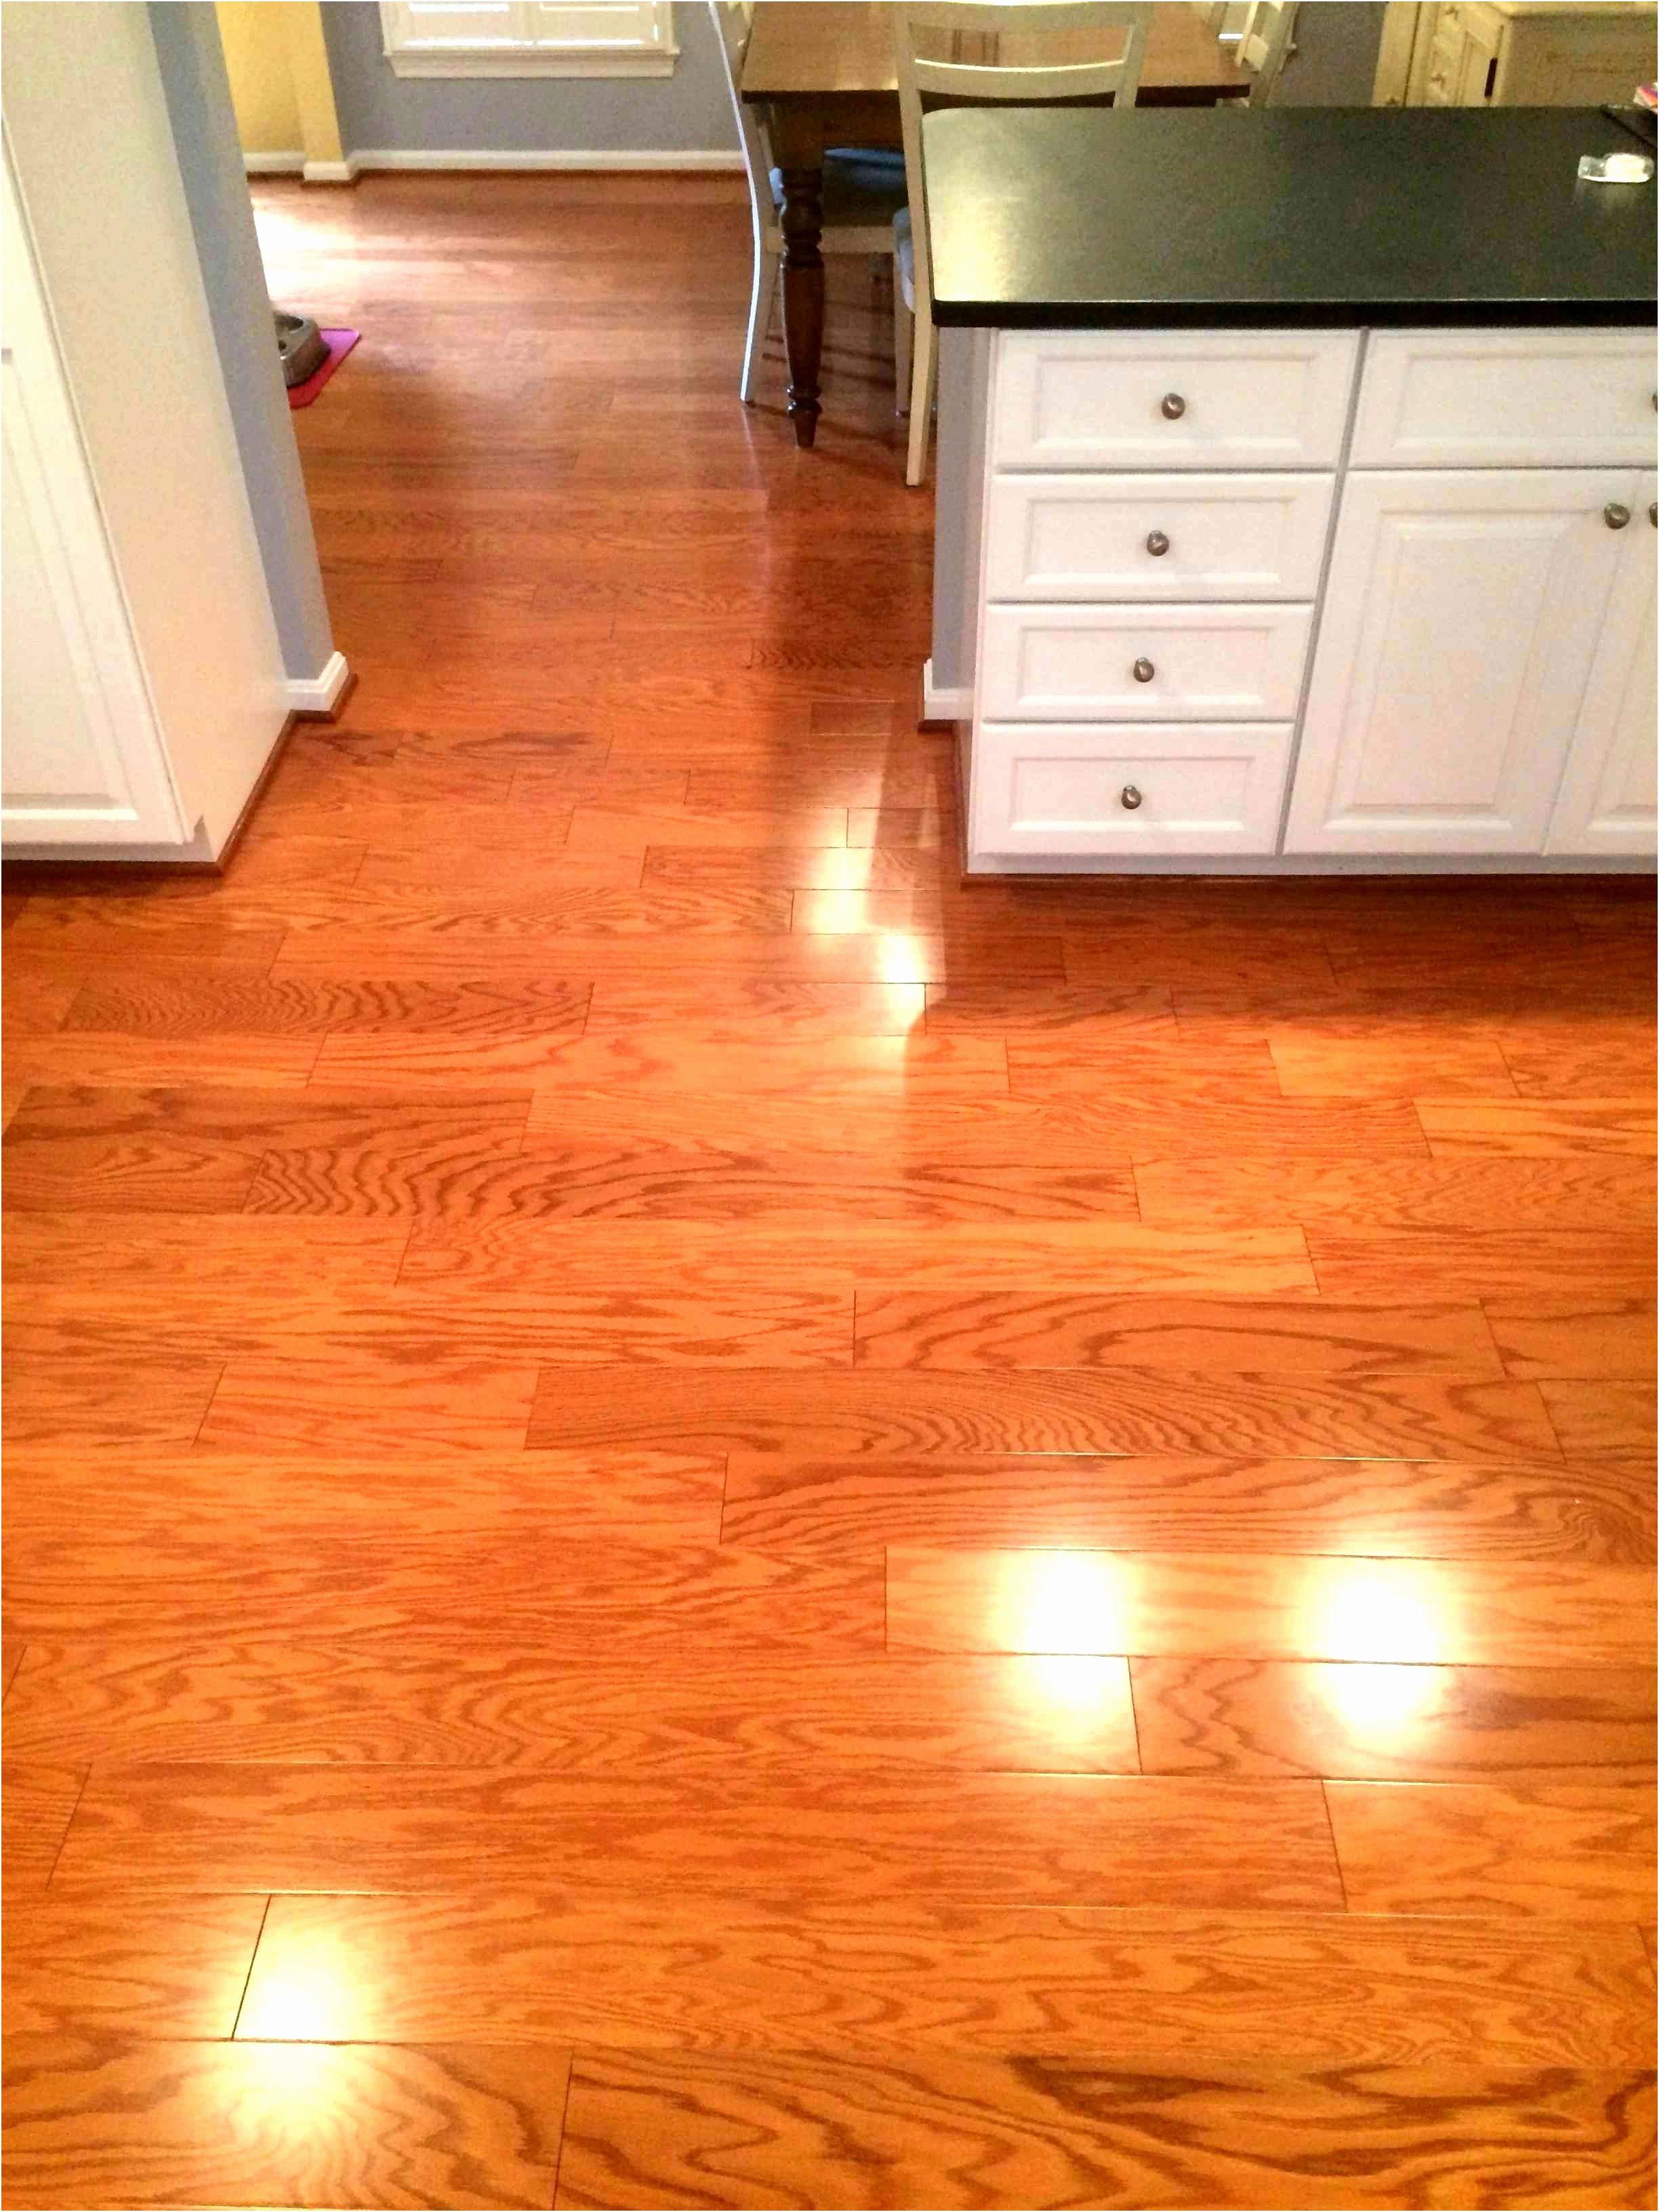 how to install hardwood flooring on plywood of 26 unique grey hardwood floors photos flooring design ideas regarding grey hardwood floors awesome 15 flawless grey wood stair treads image of 26 unique grey hardwood